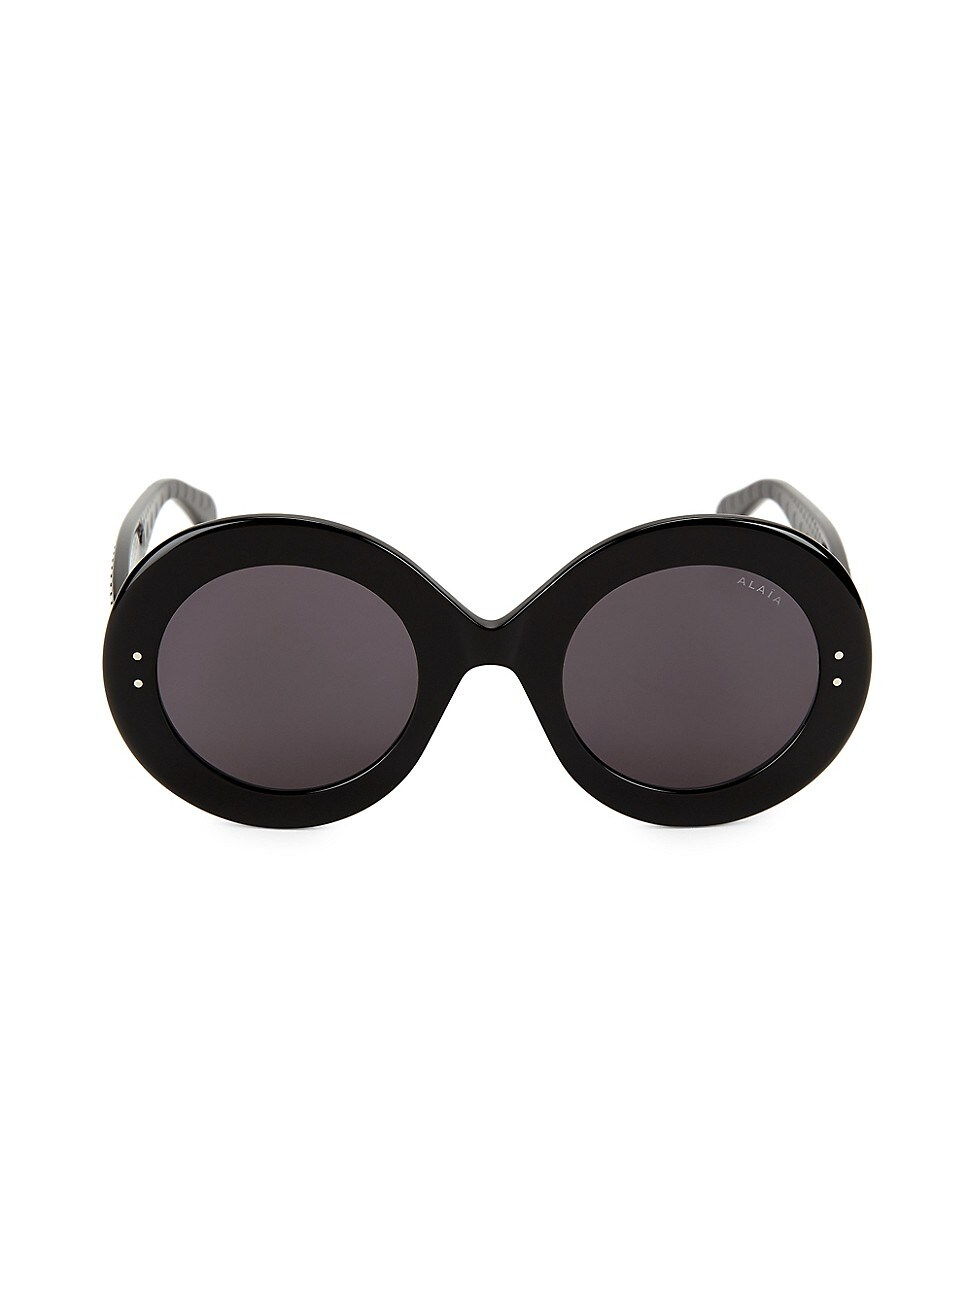 Alaïa Le Round Clou 50mm Oversized Round Sunglasses In Black